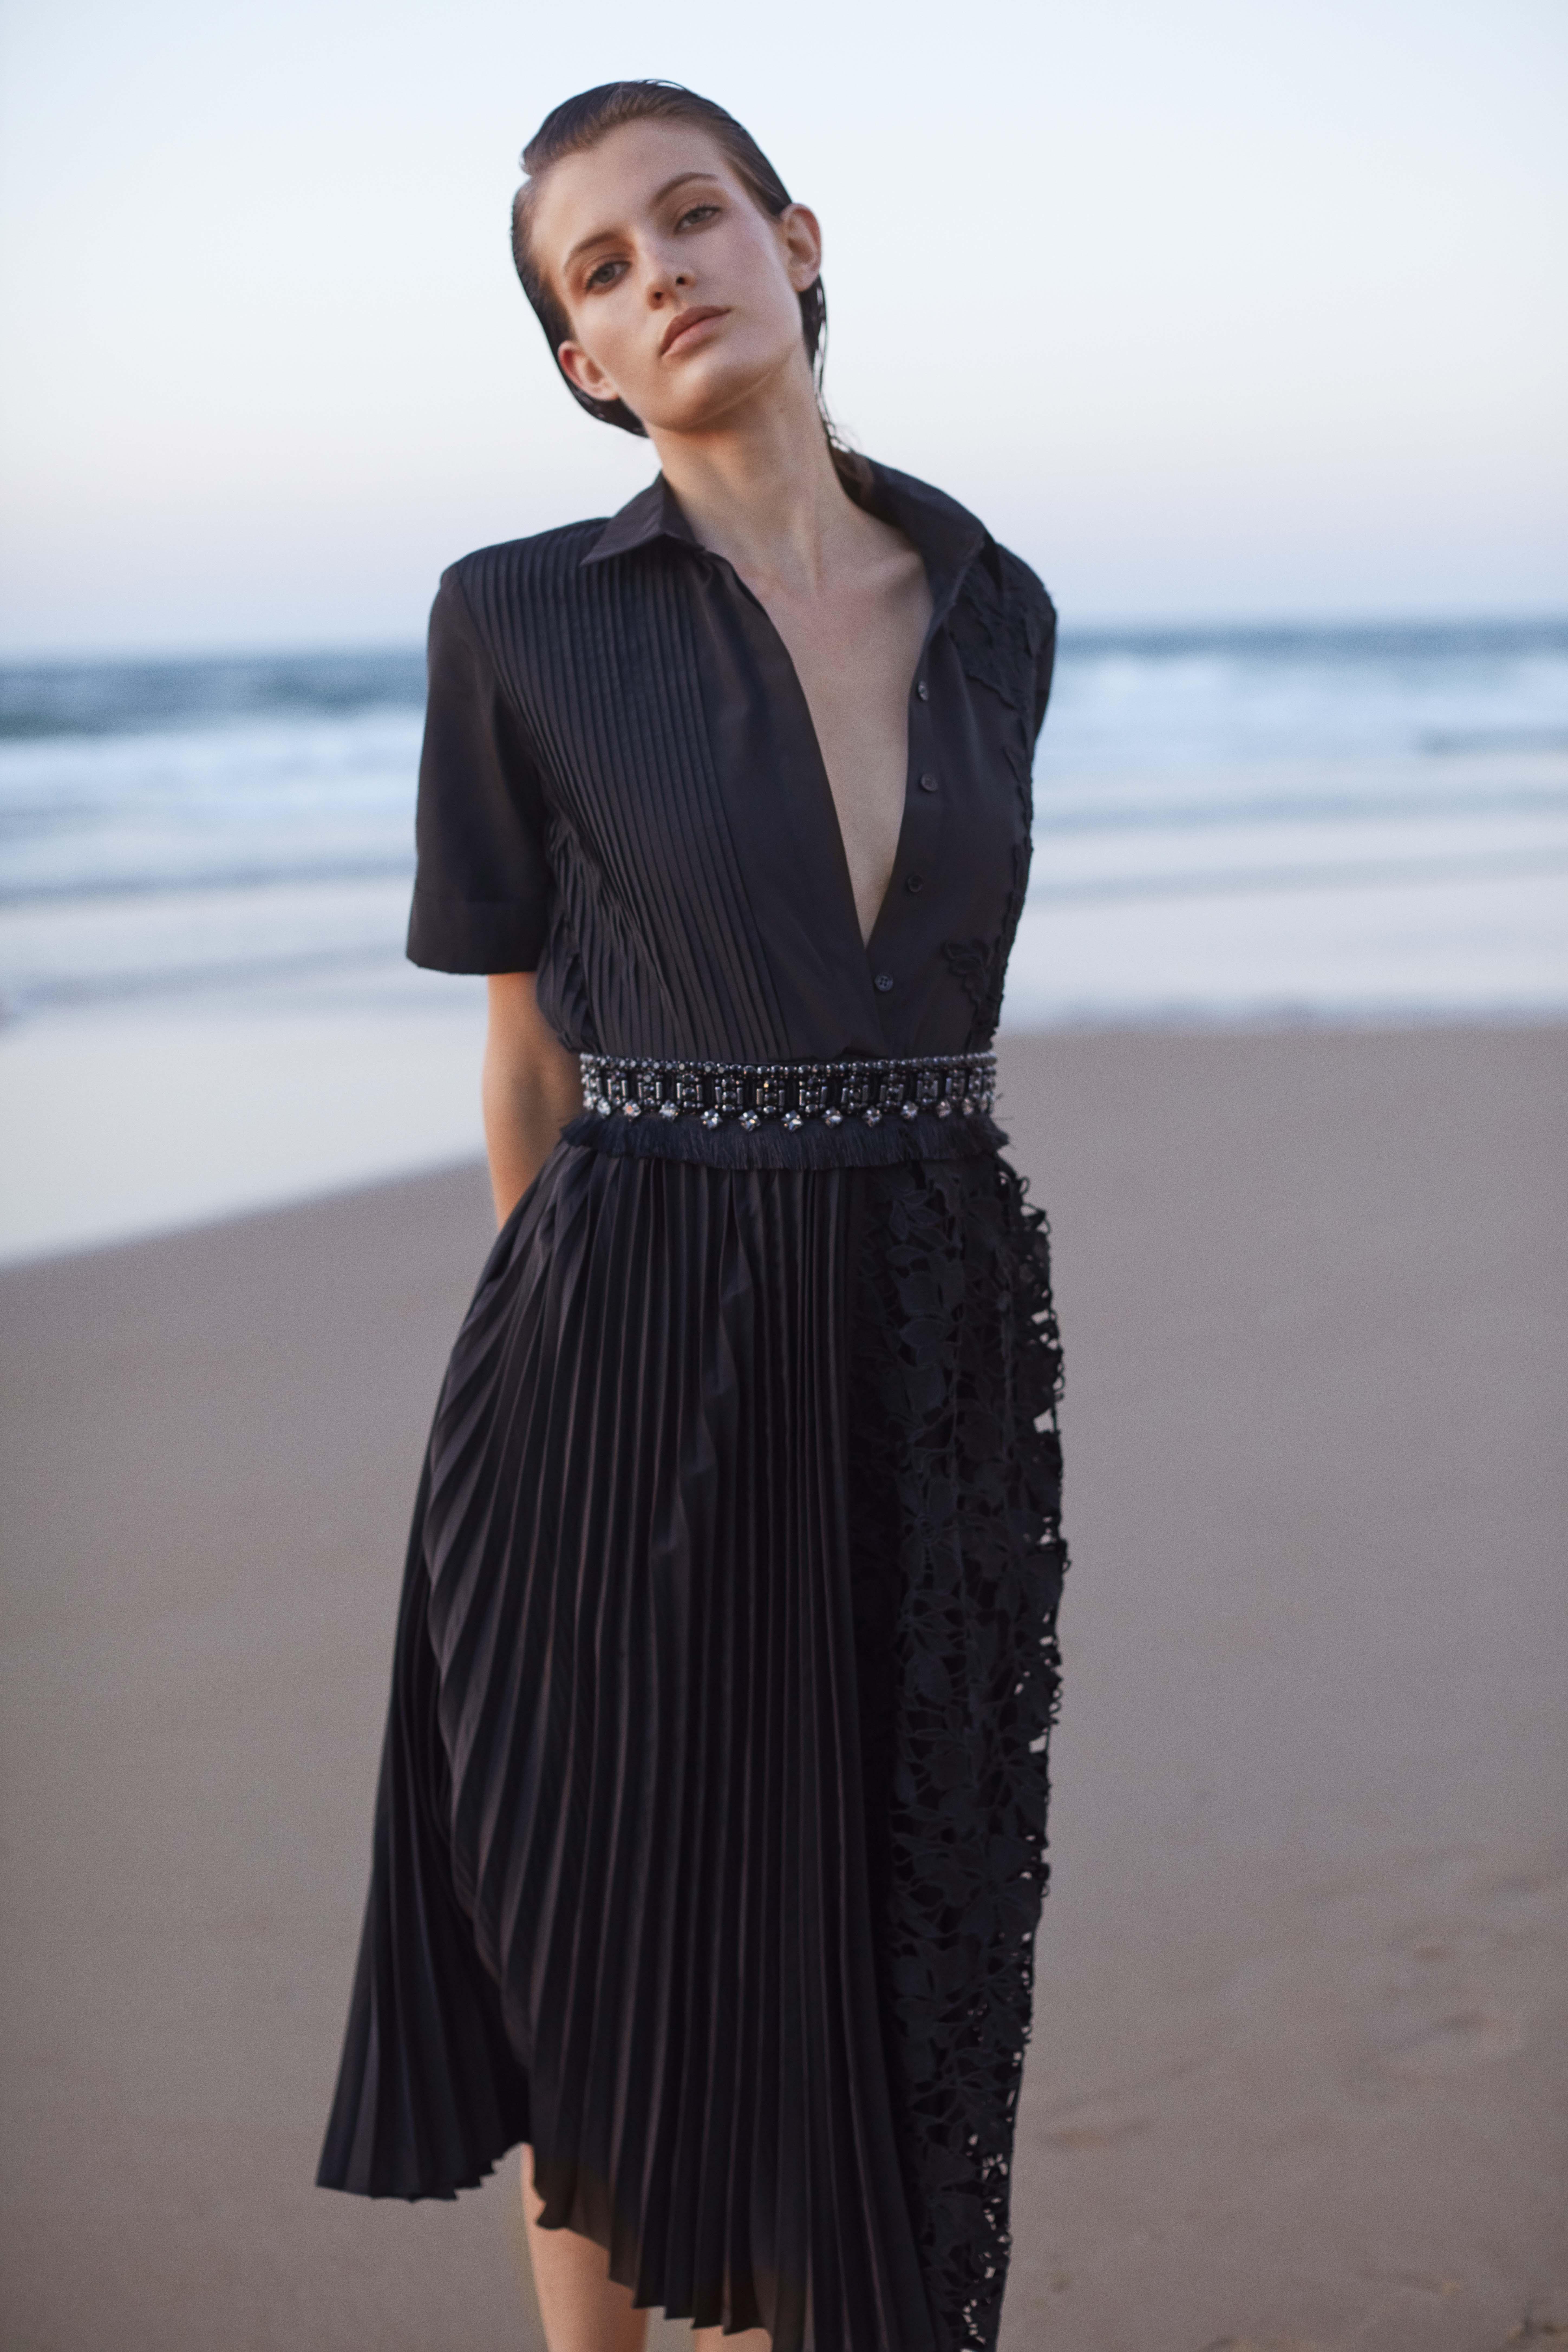 Sezon Trendi İpekyol Elbise Modelleri 2019 – 2019